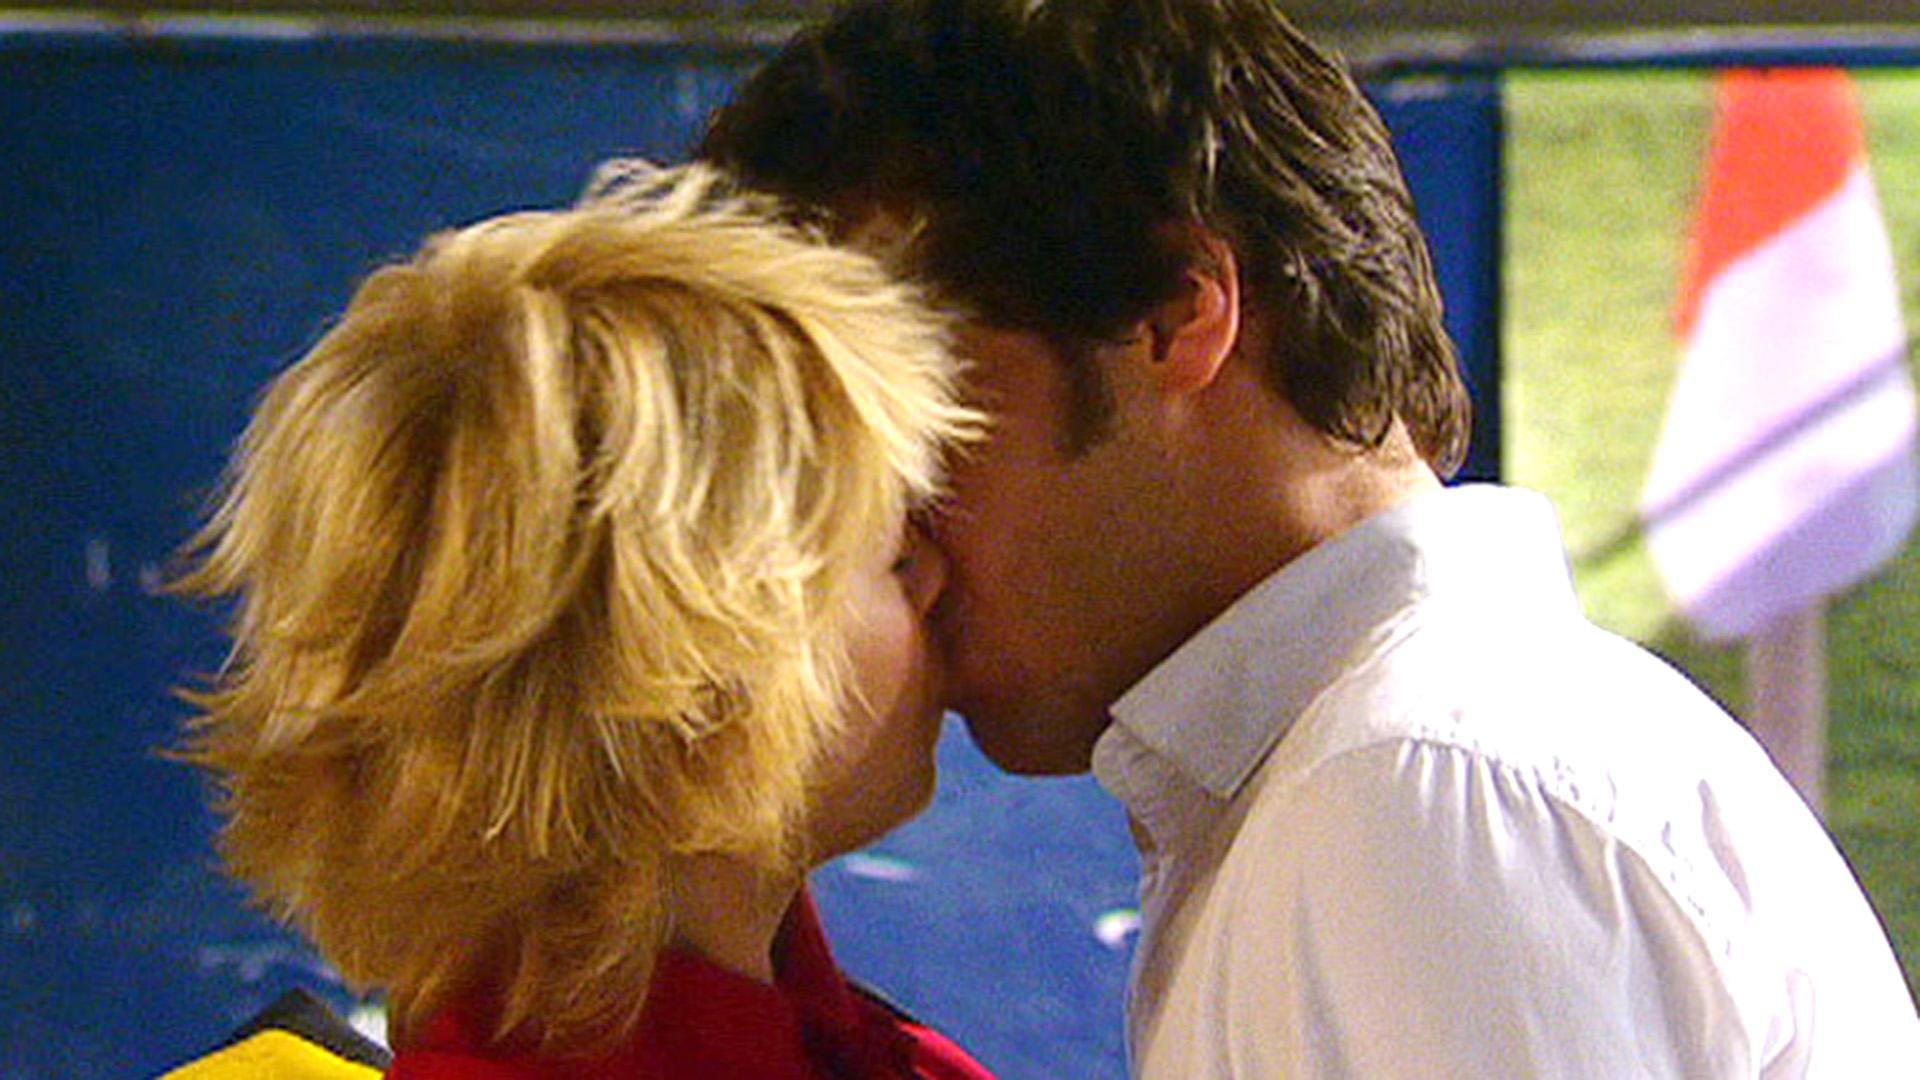 Verliebt sich Julian in Diana? | Folge 18